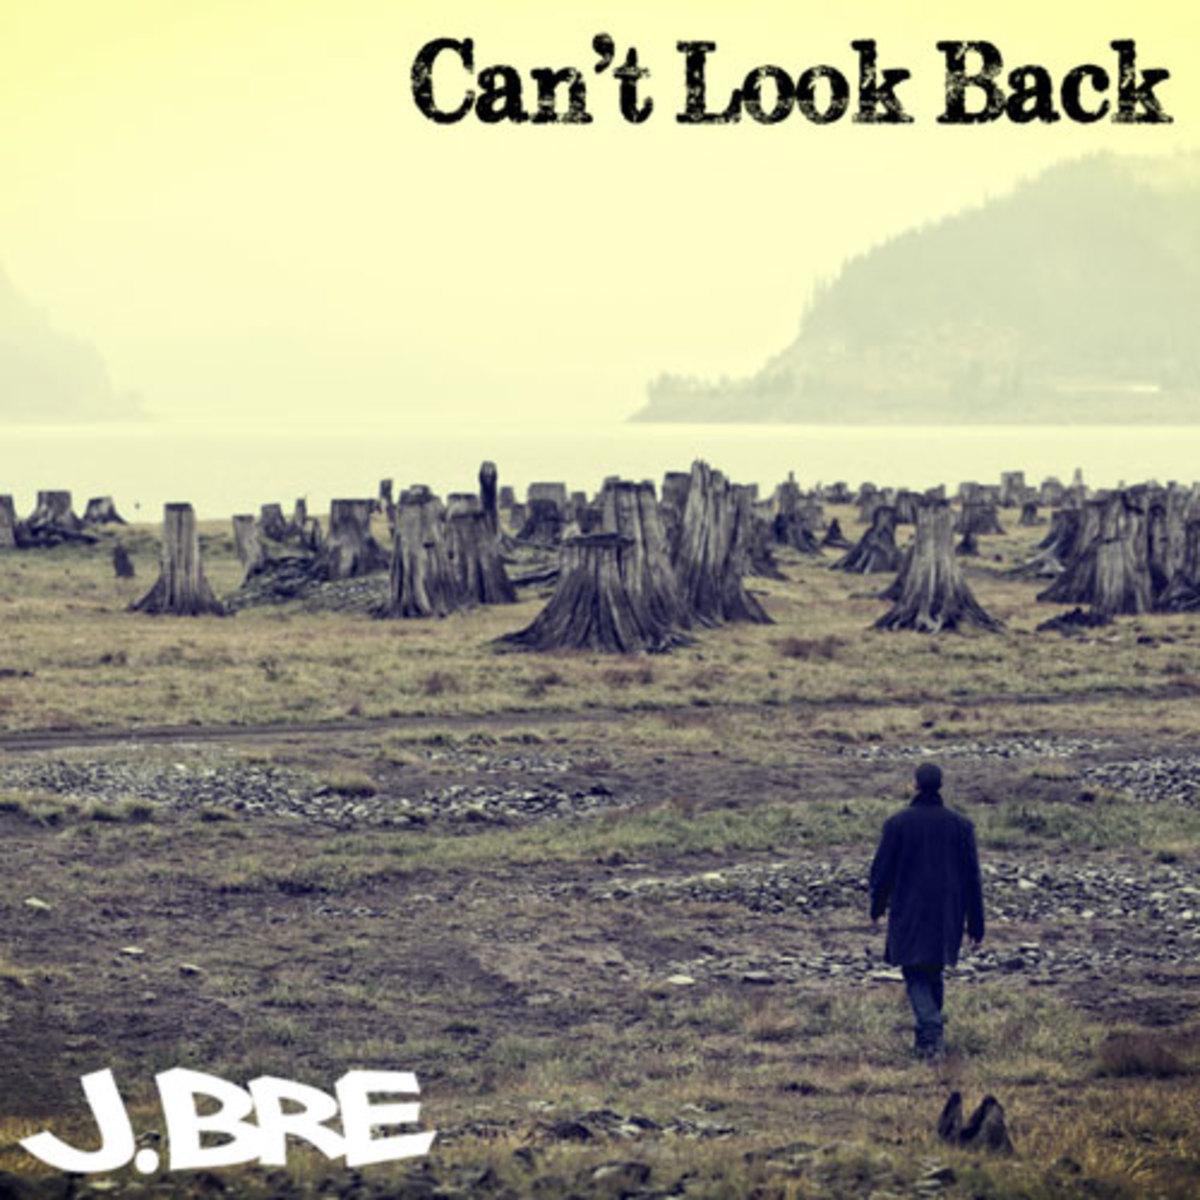 jbre-cantlookback.jpg